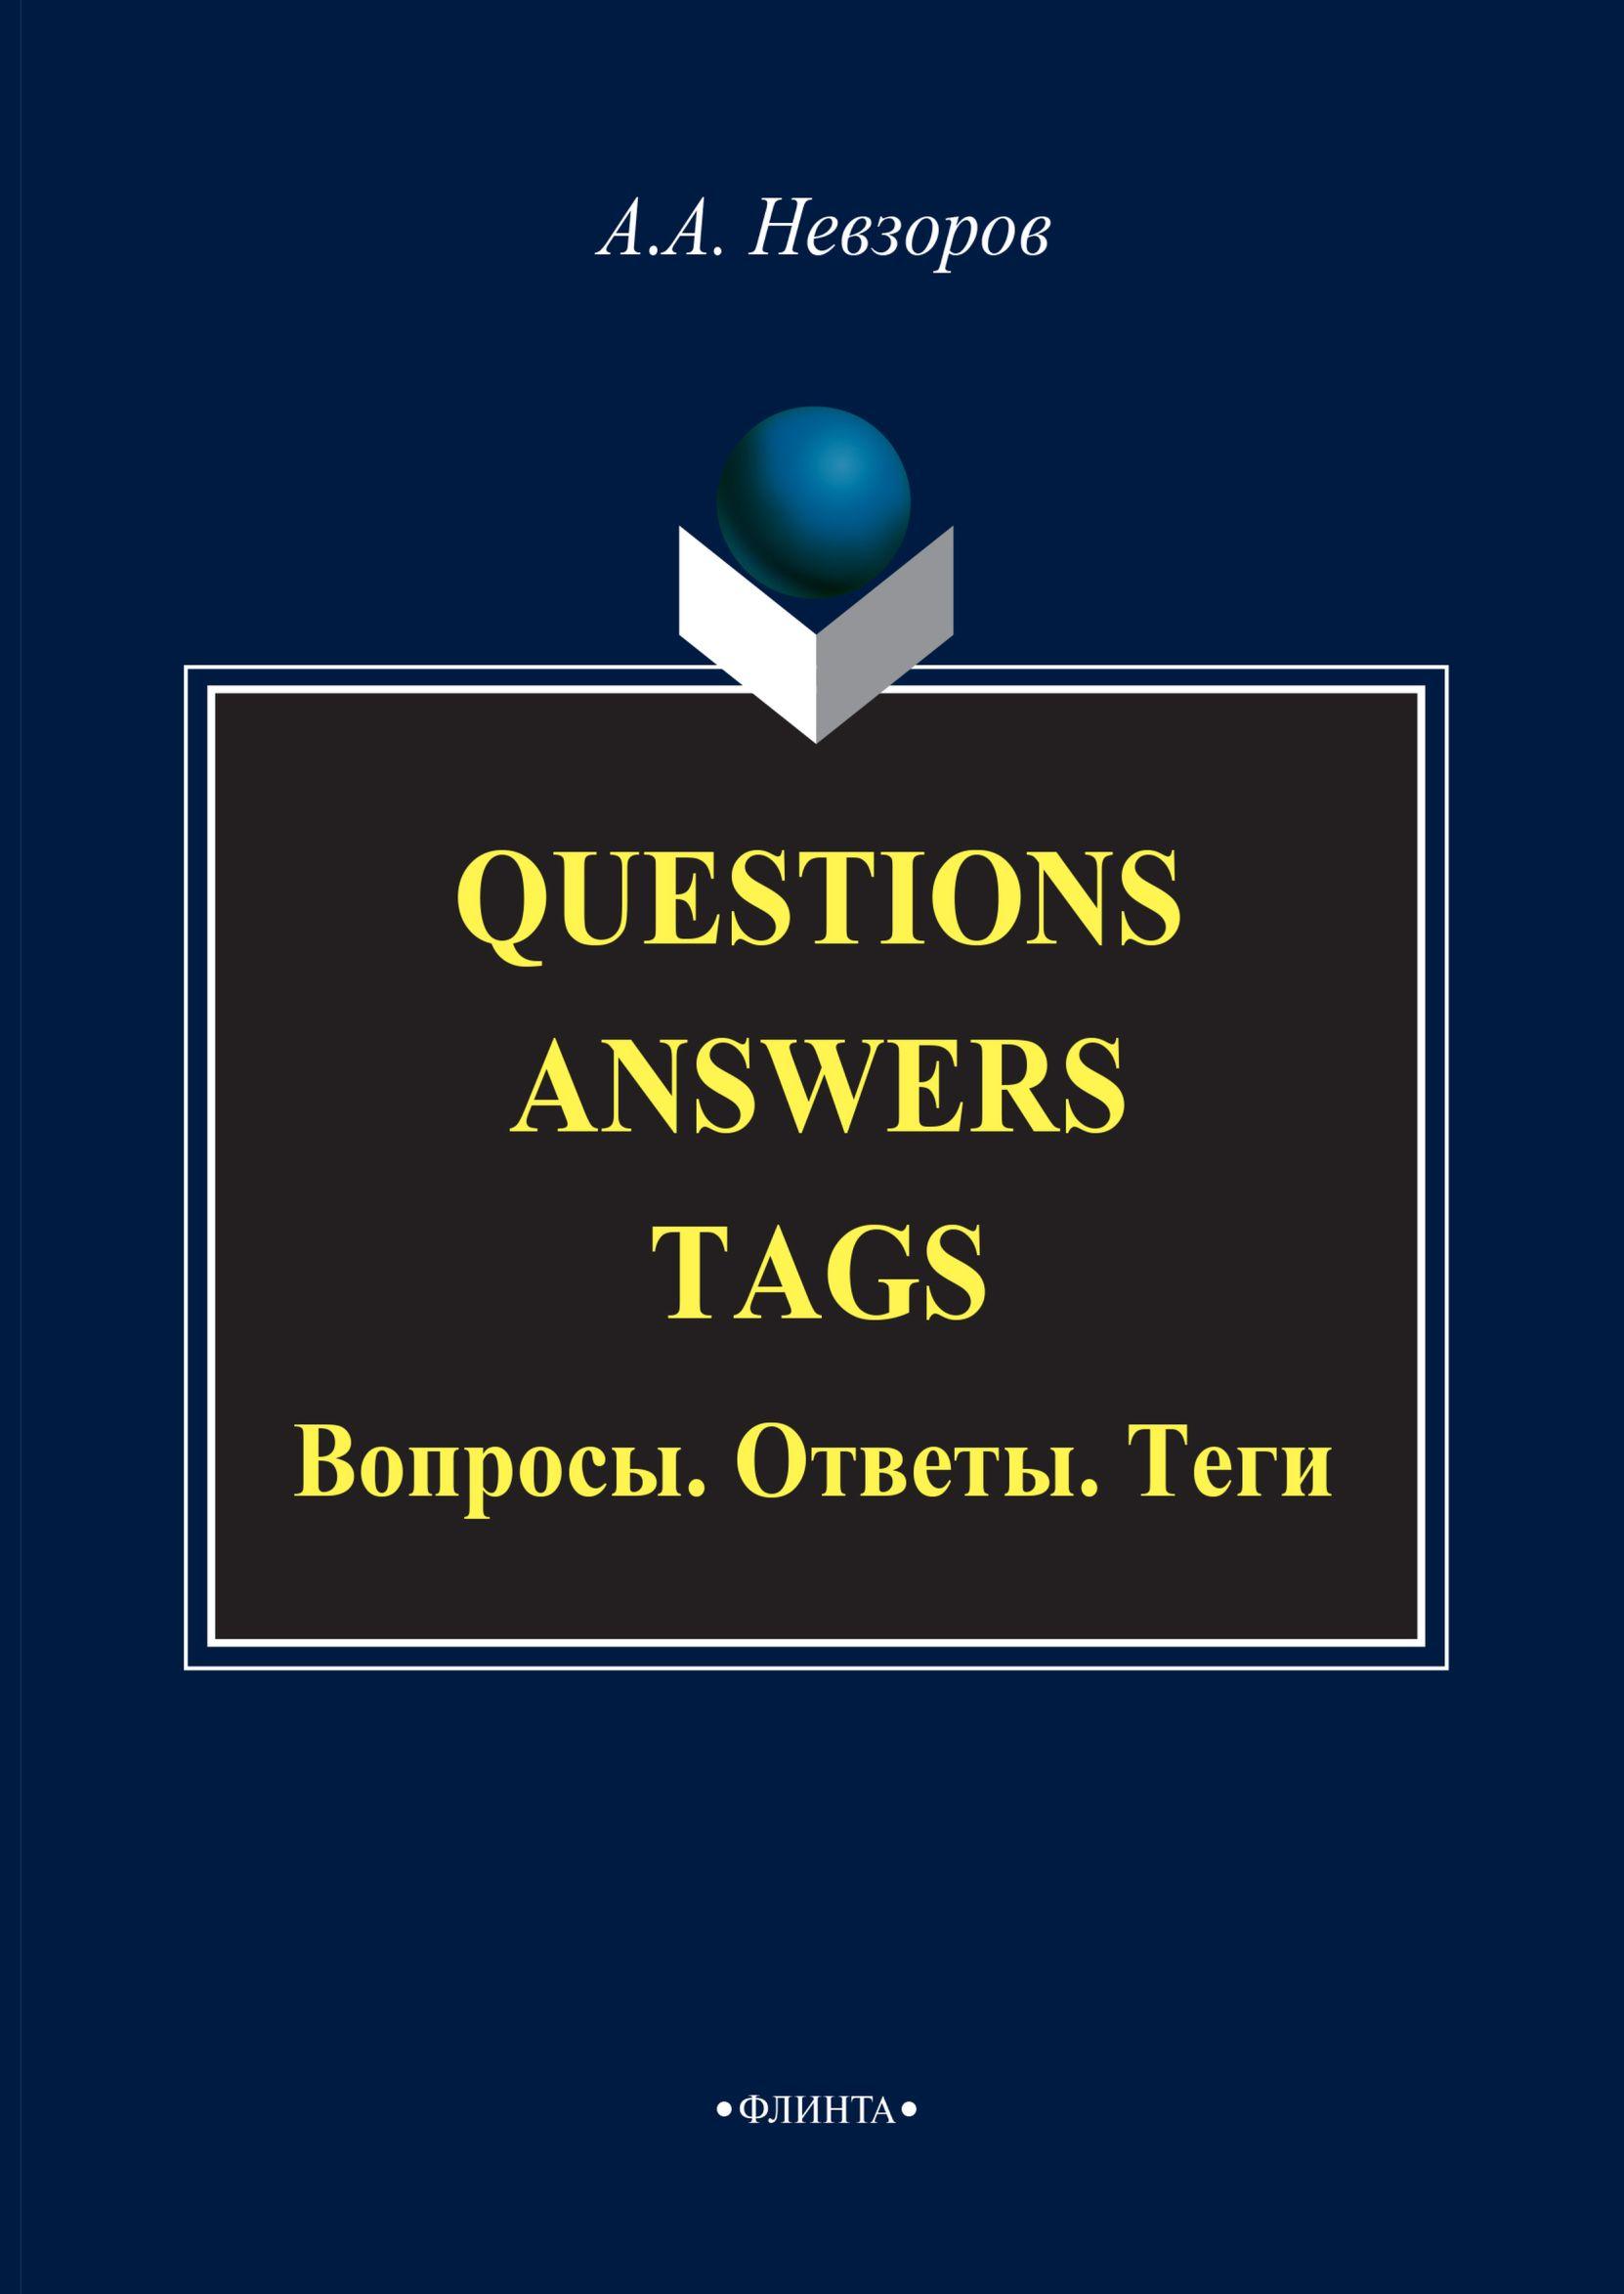 Questions. Answers. Tags / Вопросы. Ответы. Теги